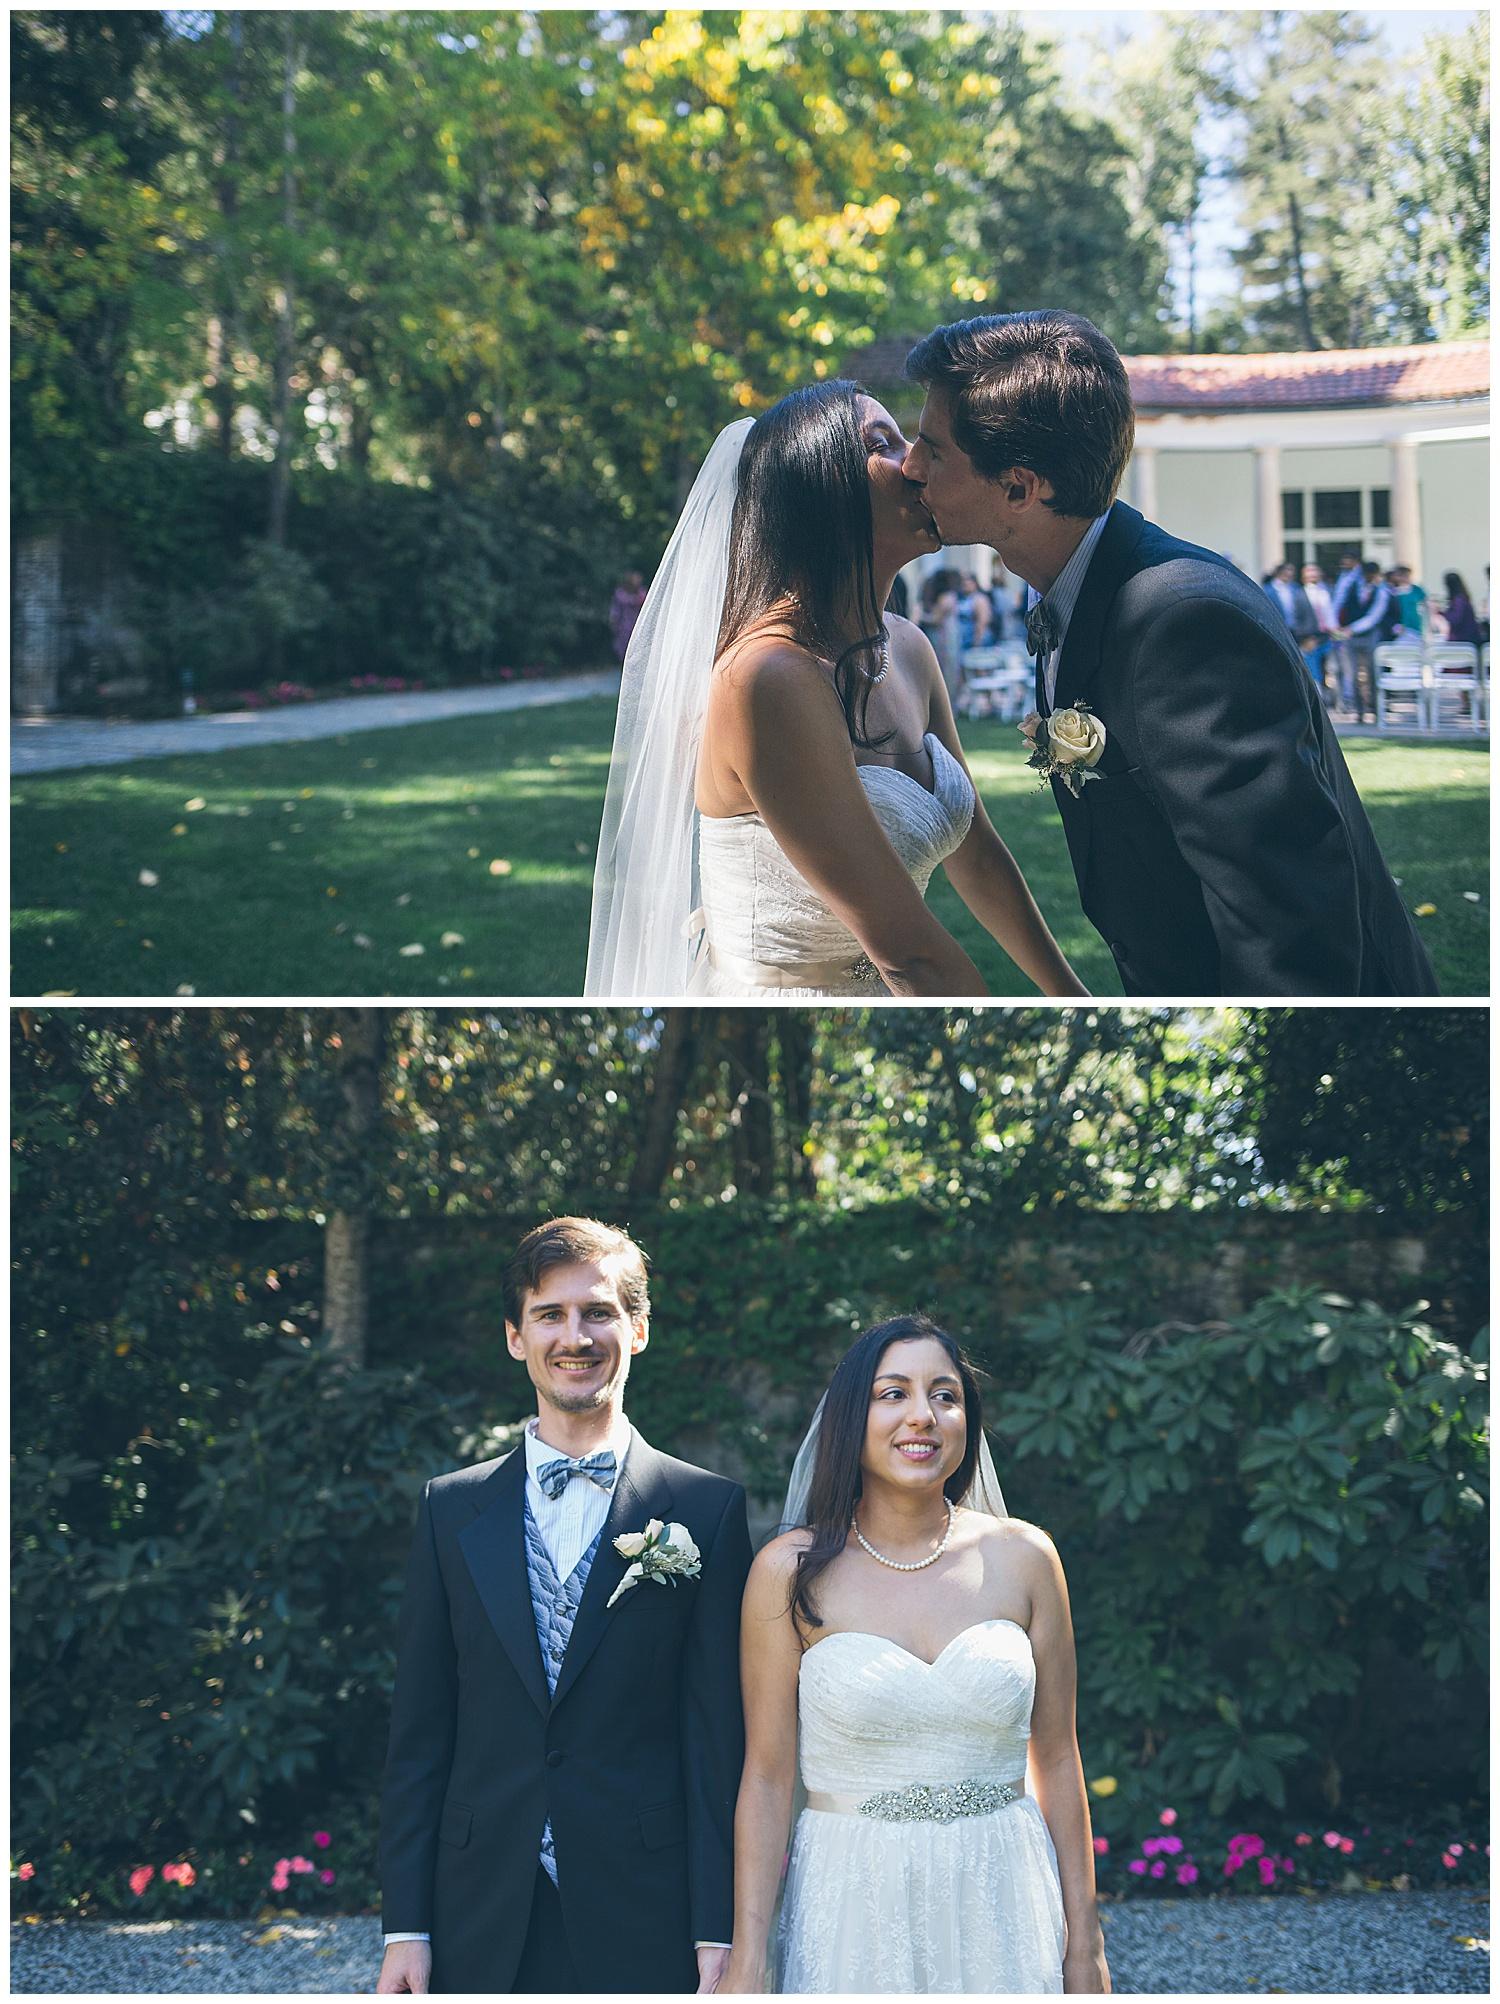 khariza-rae-photography-bay-area-wedding-photographer_0151.jpg